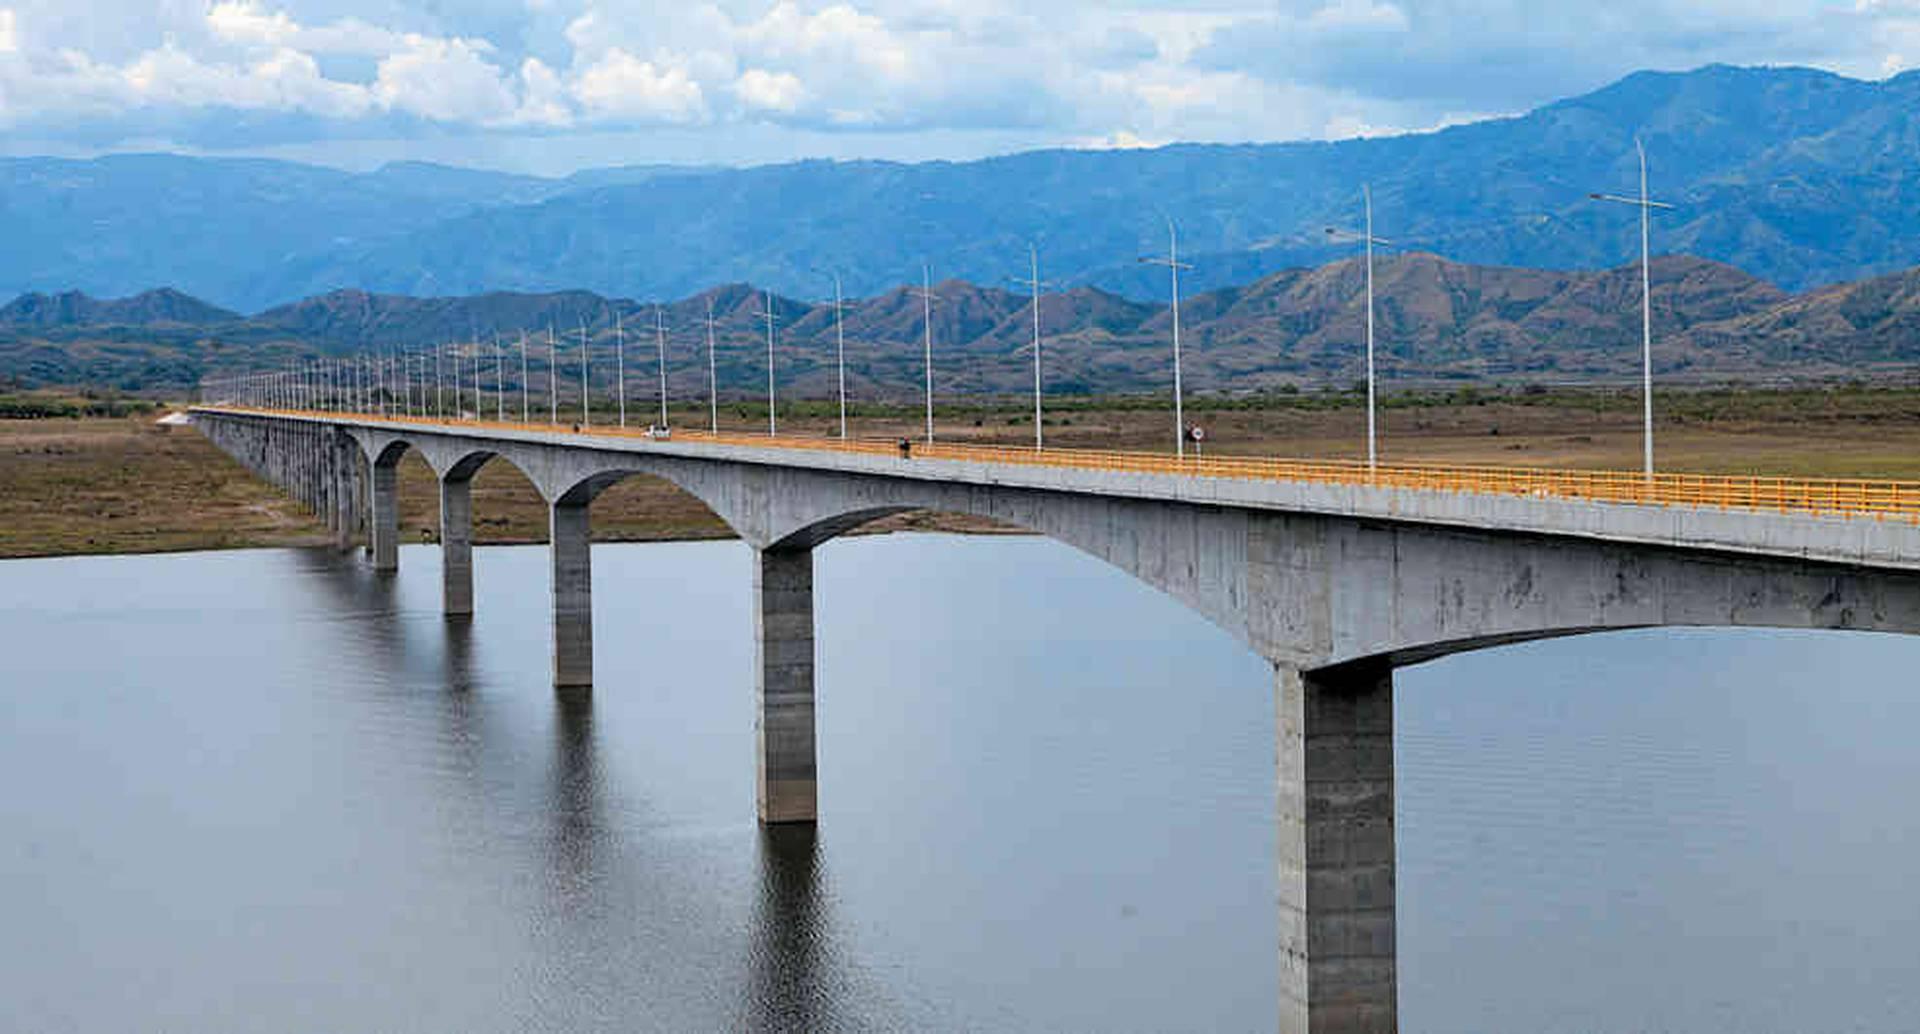 Puente Balseadero, represa del Quimbo, Huila.